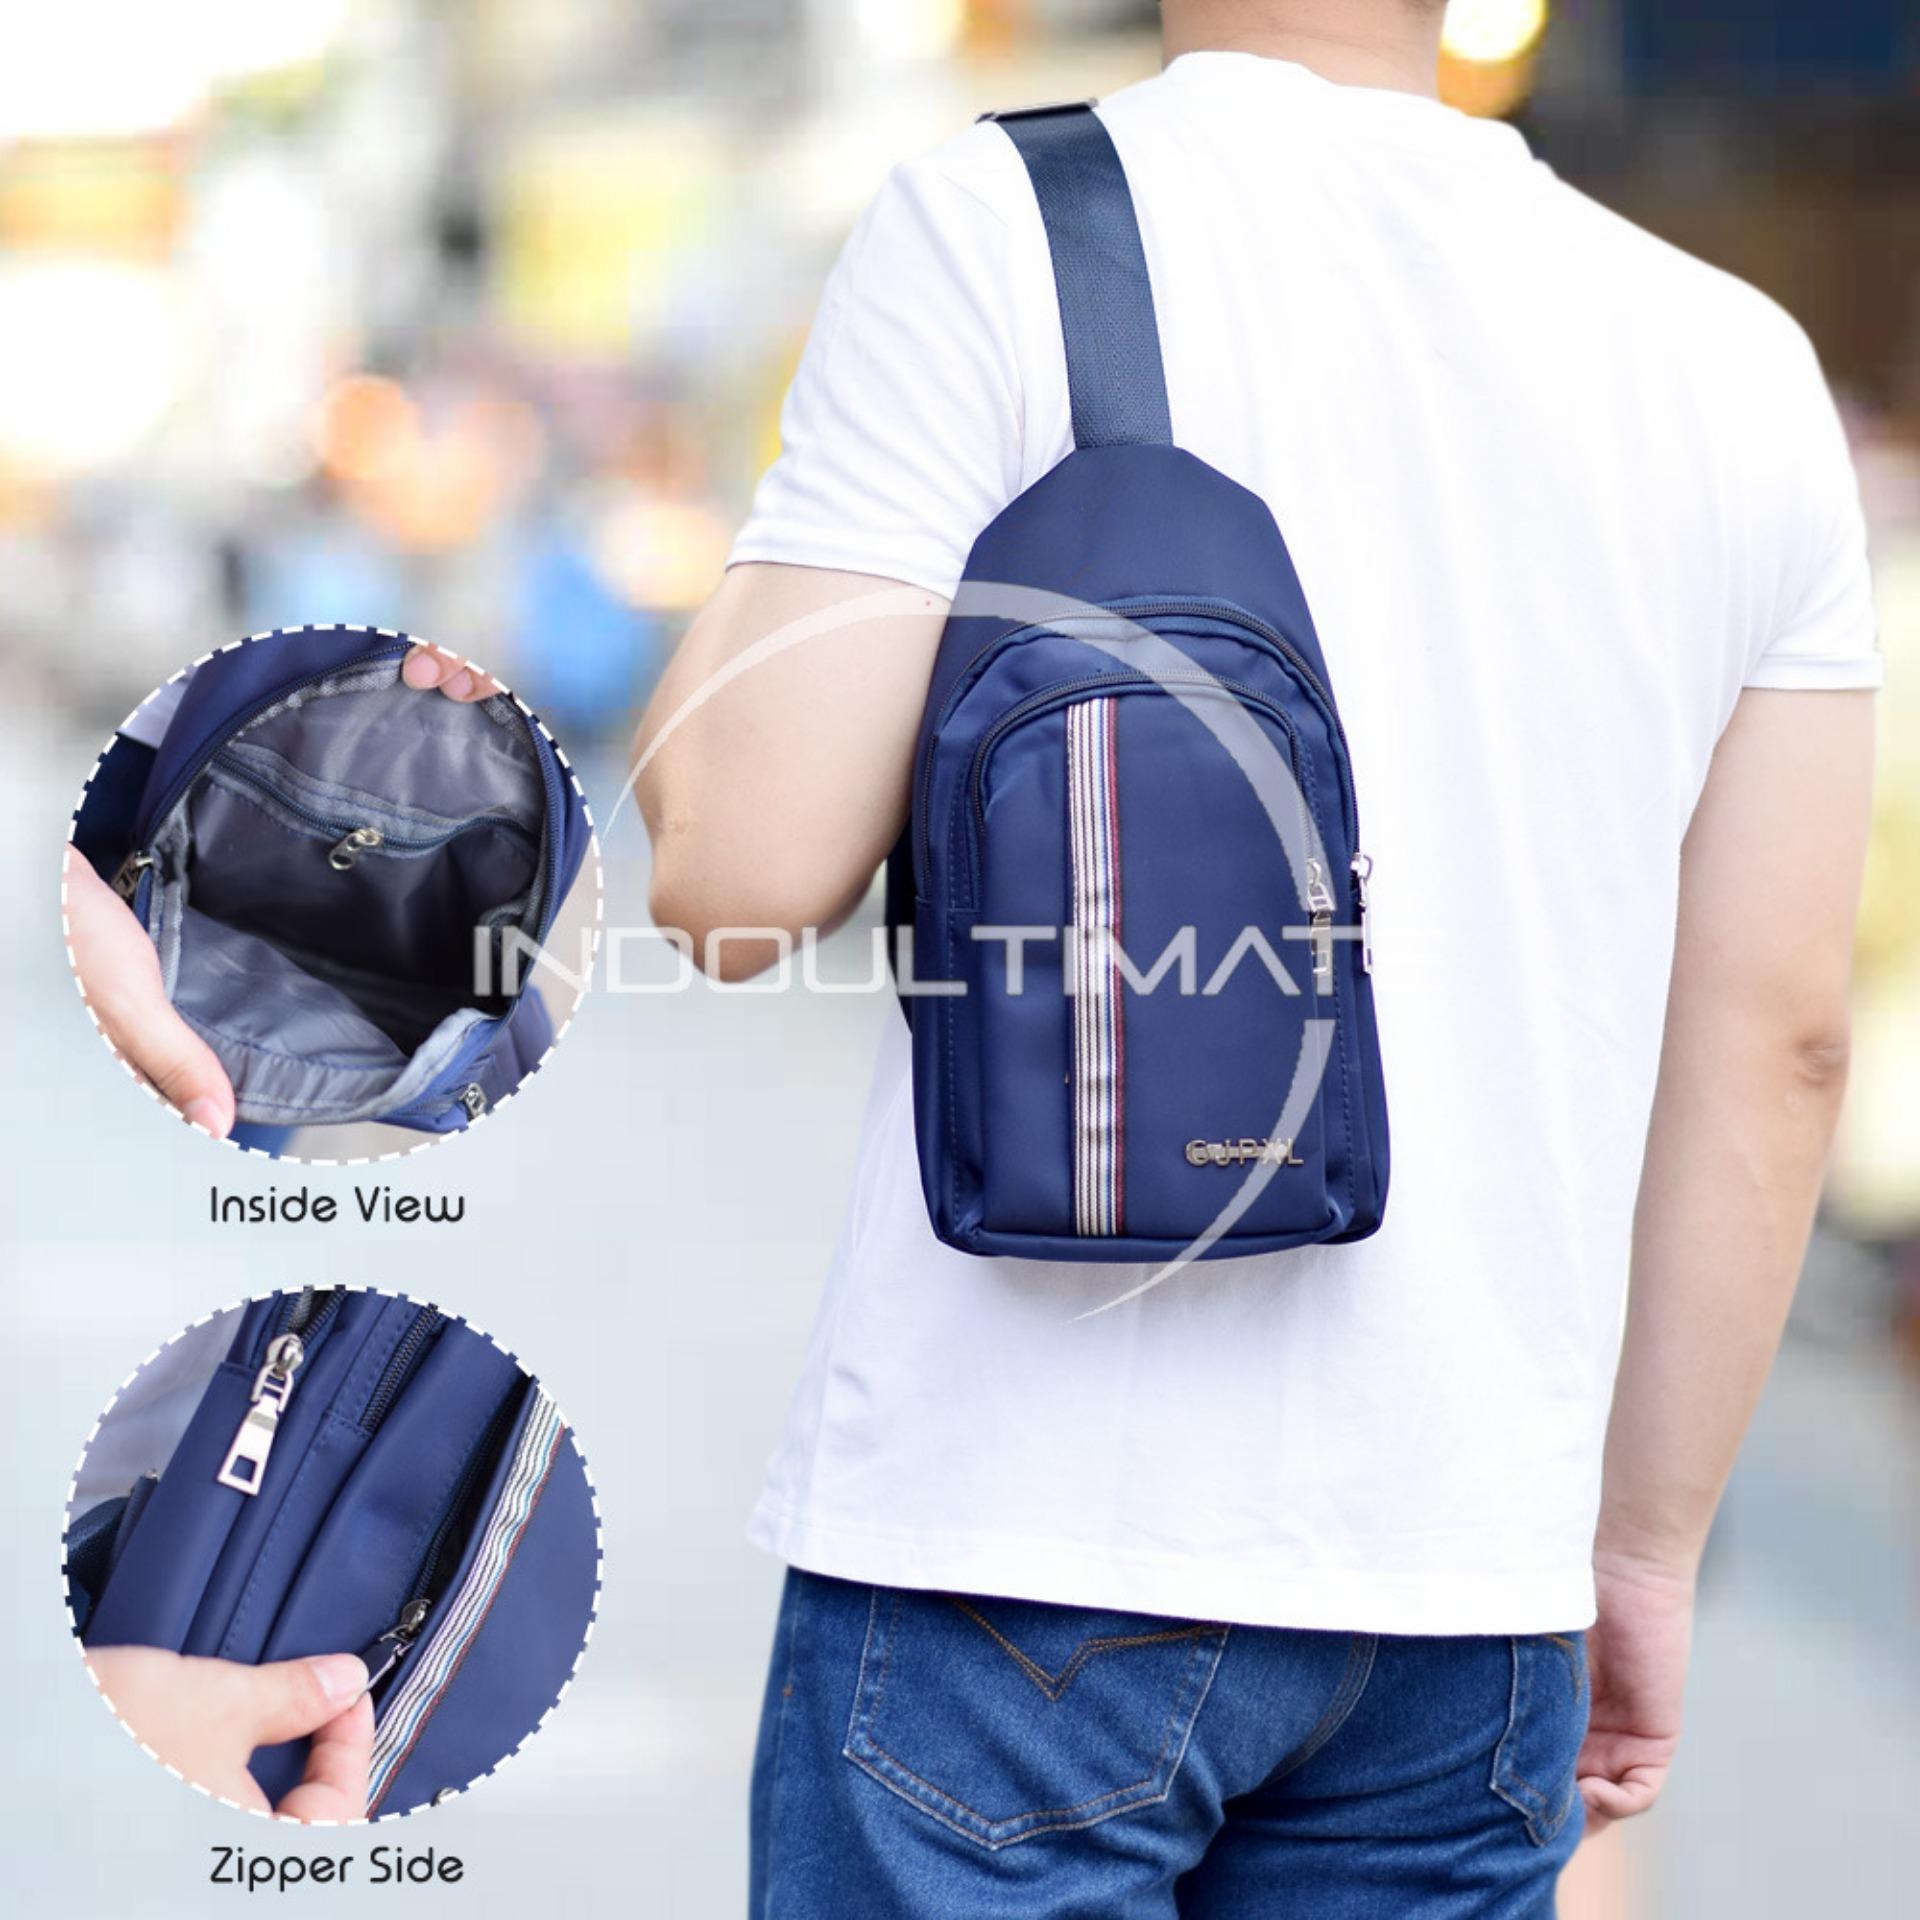 Dapatkan Segera Ultimate Tas Pria Tb 9868 Dark Blue Tas Kerja Selempang Slempang Import Korea Kecil Batam Traveling Murah